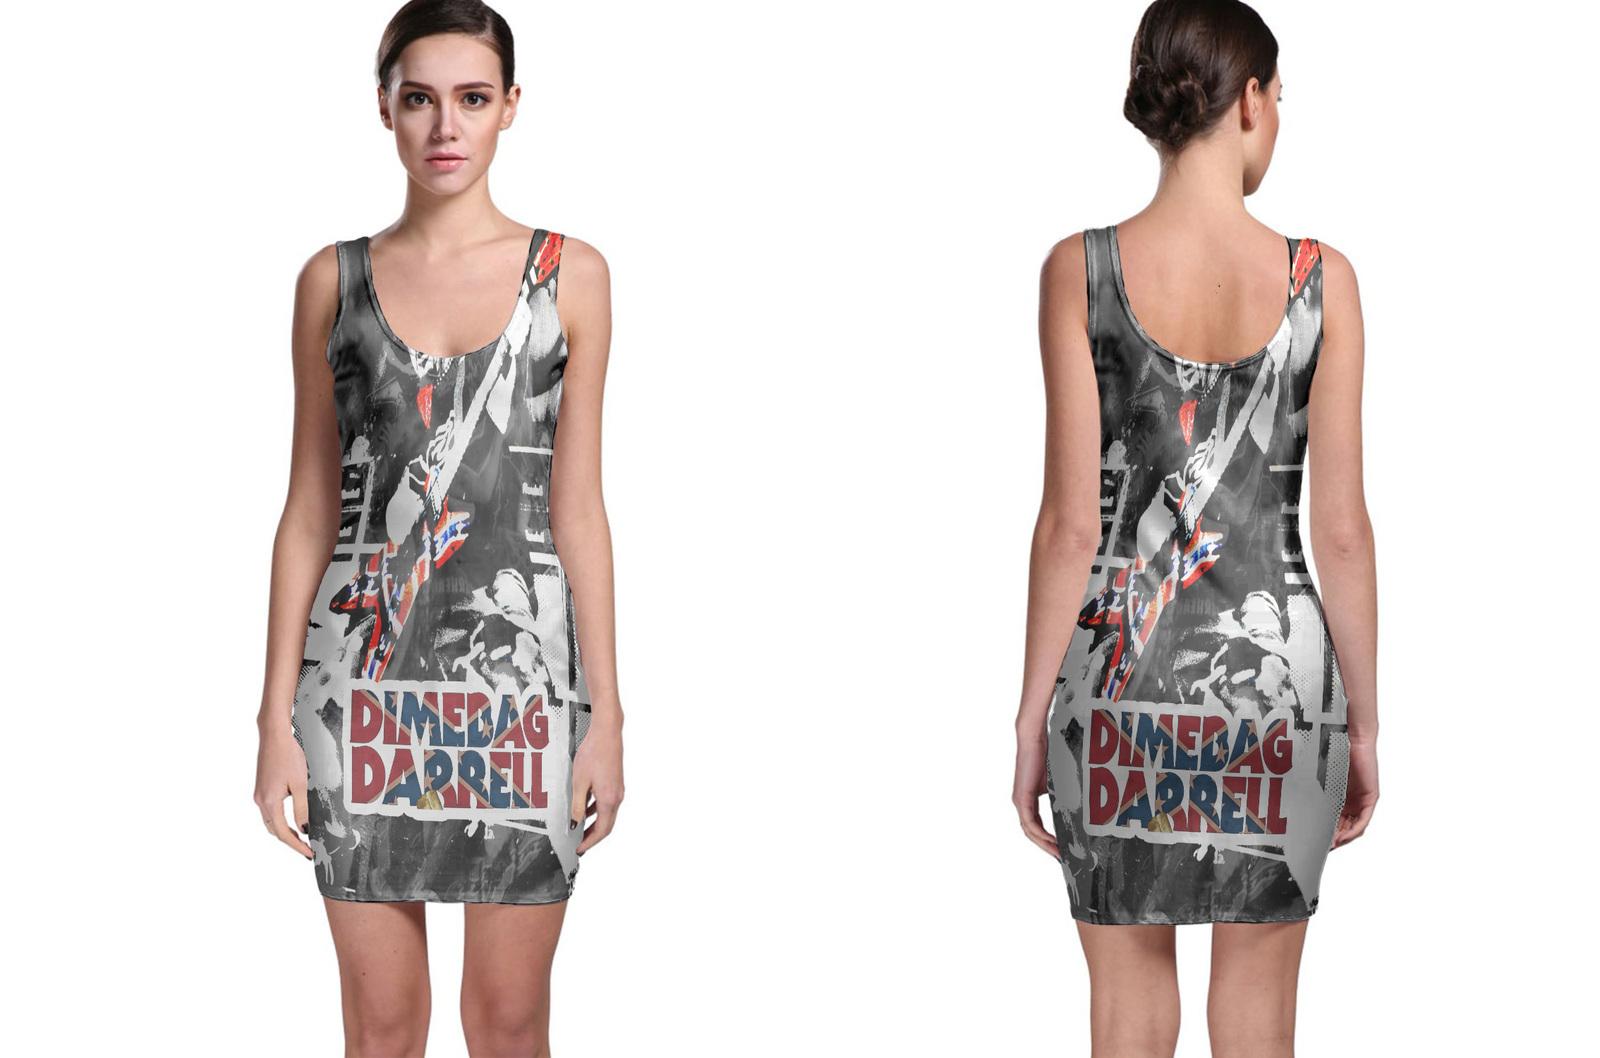 DIMEBAG DARRELL Bodycon Dress